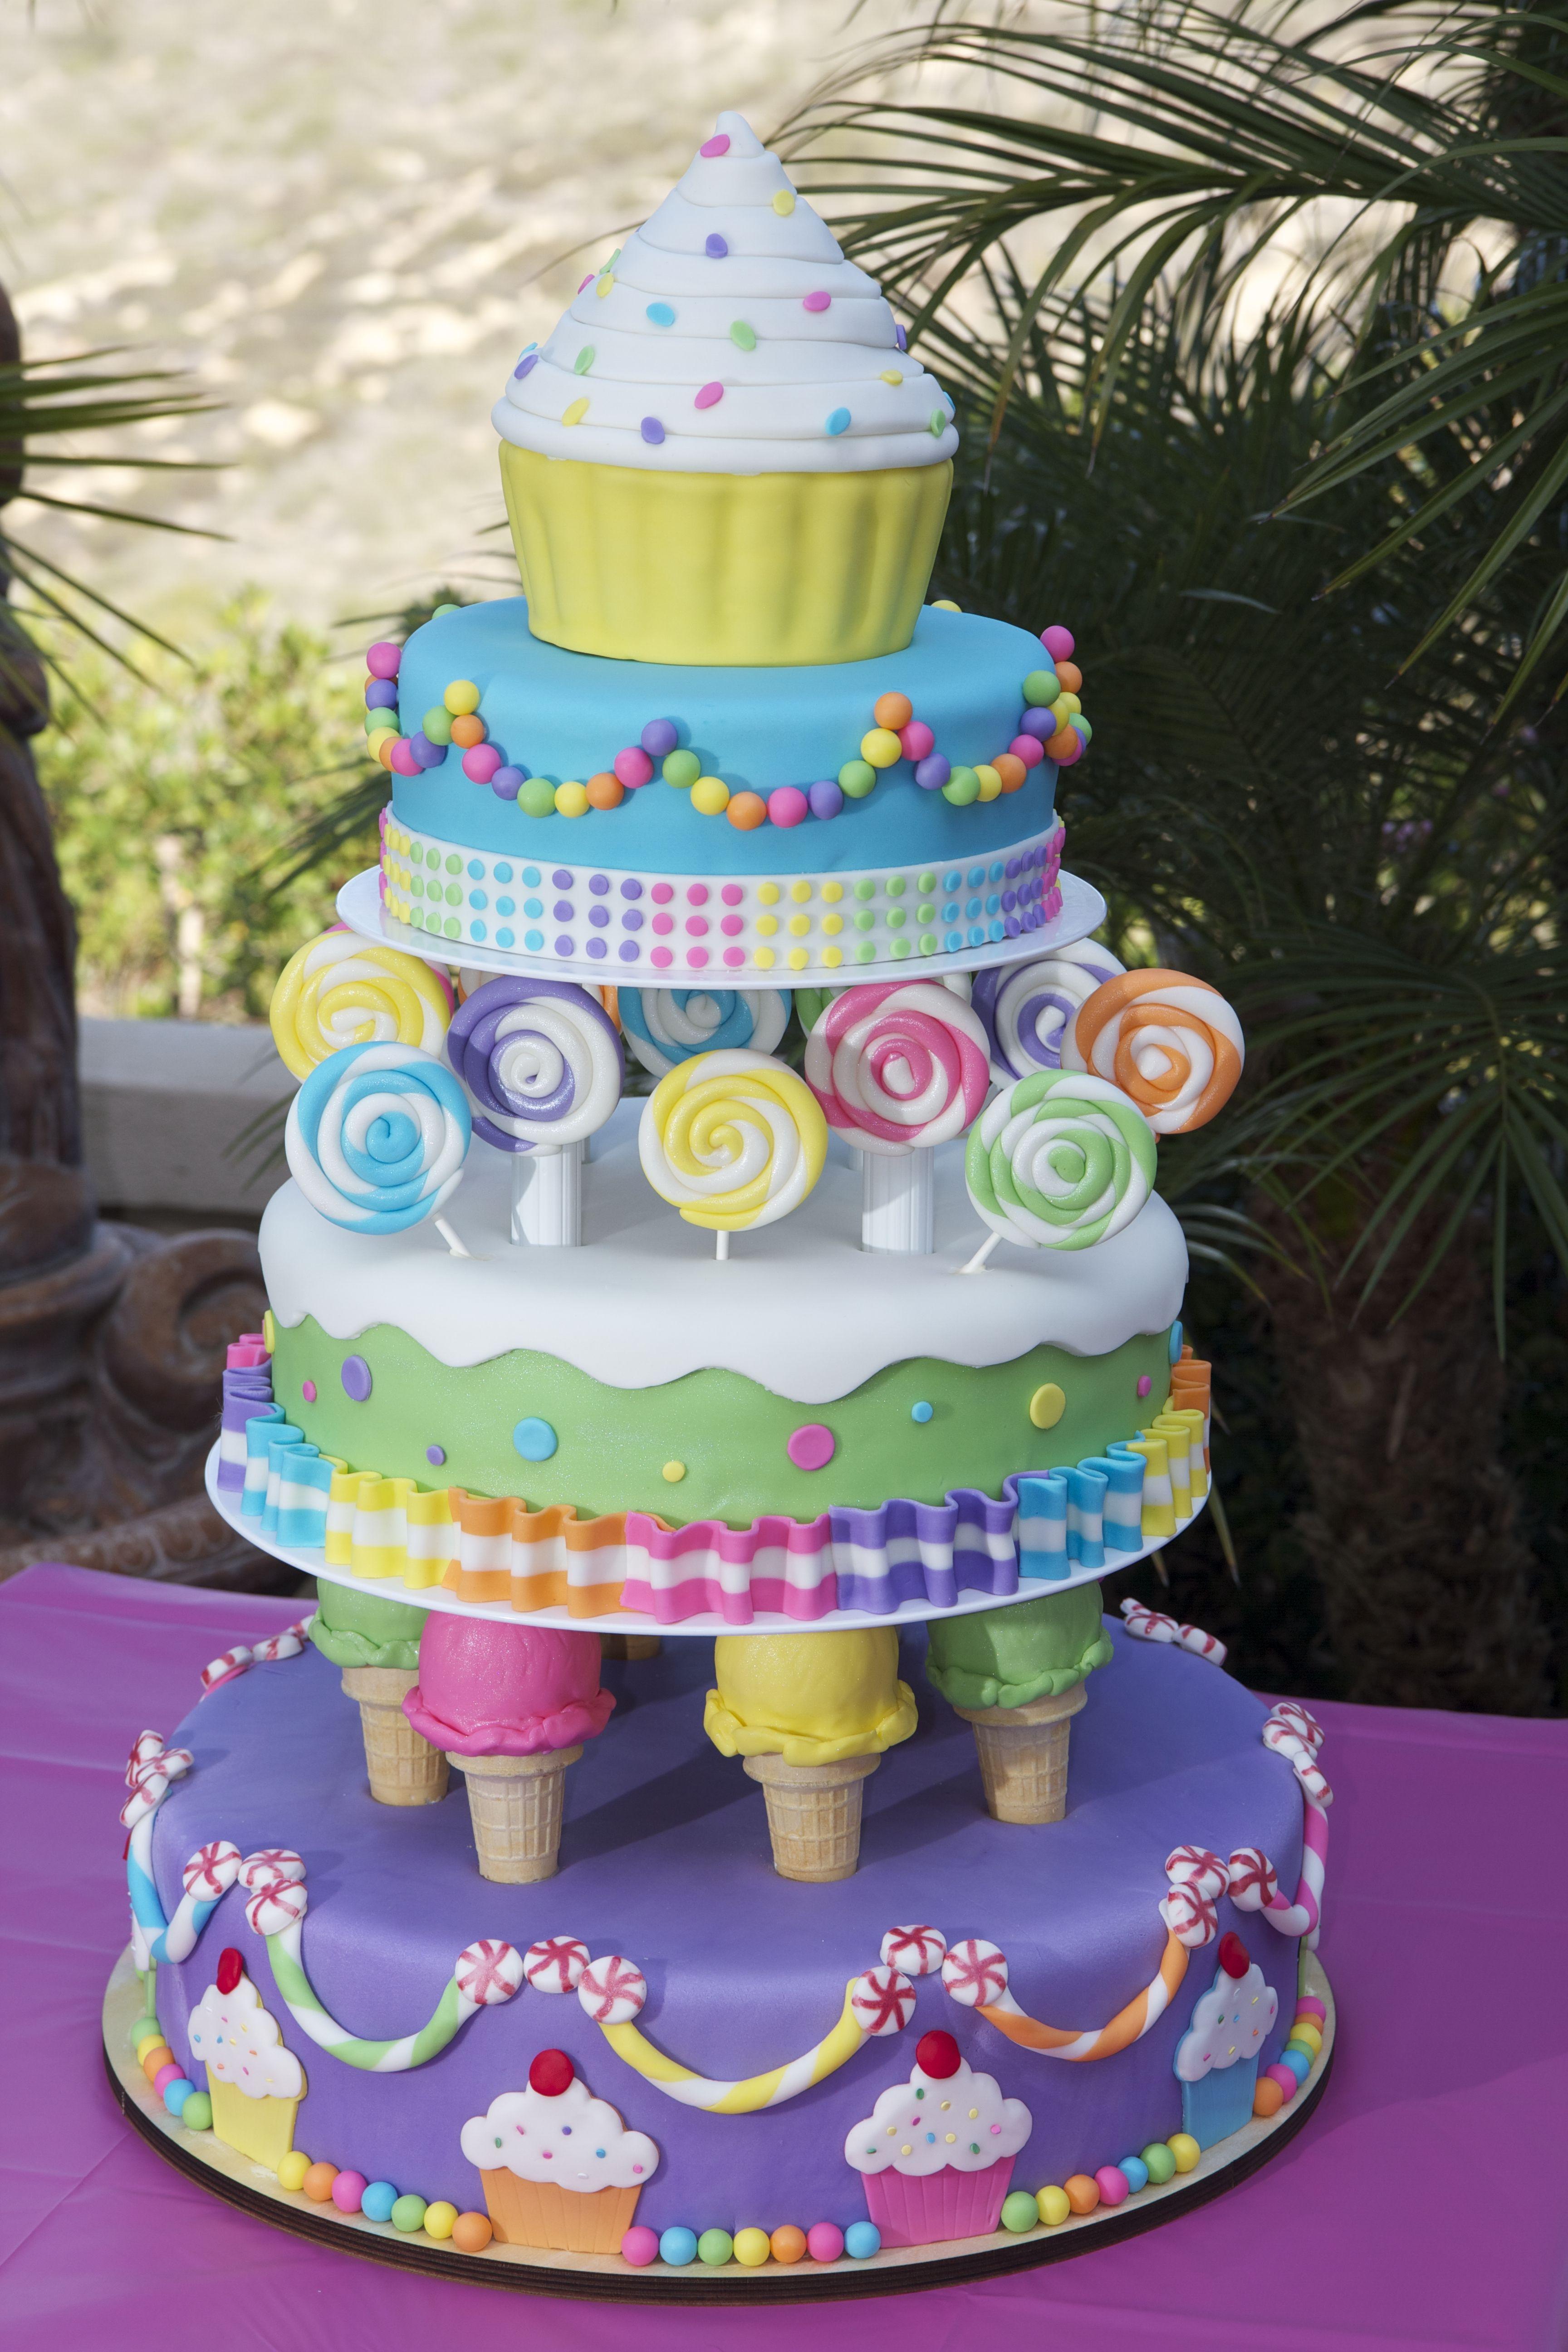 Candy Land Party Ideas Pinterest Tortilla Pastelera y Tortas